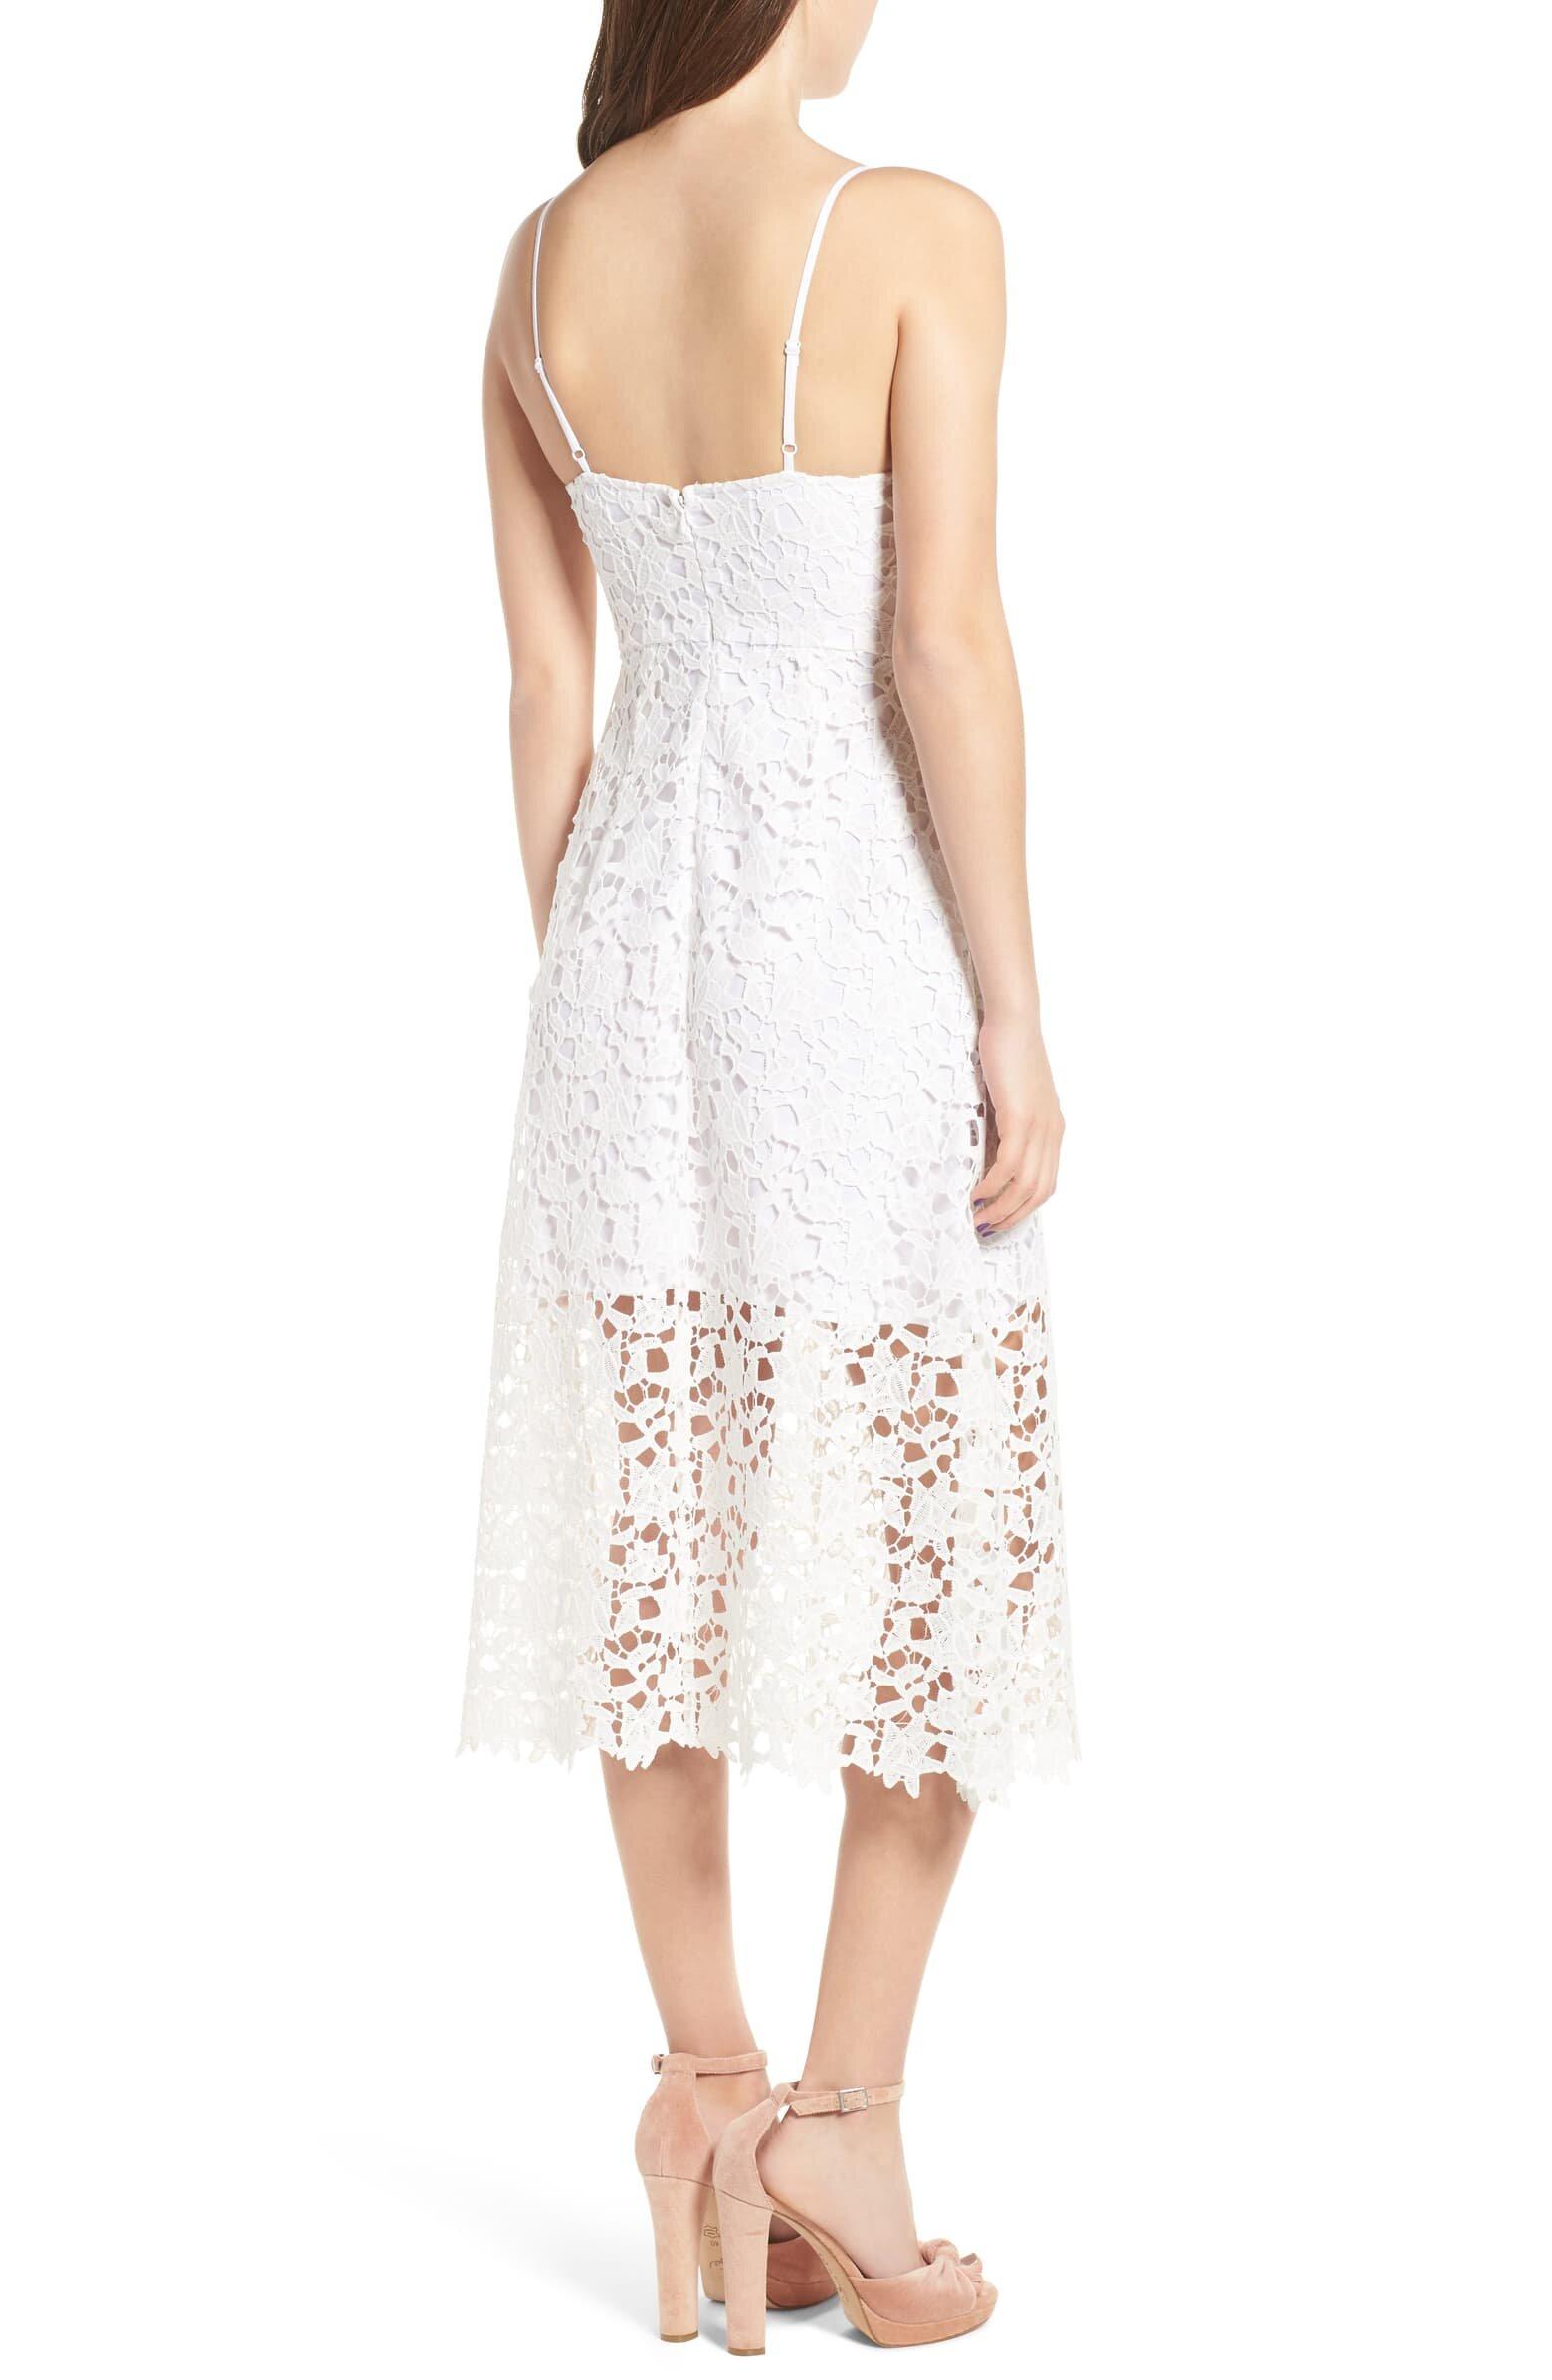 WESTWOOD WHITE HALF SLEEVE SHEATH DRESS_.jpeg